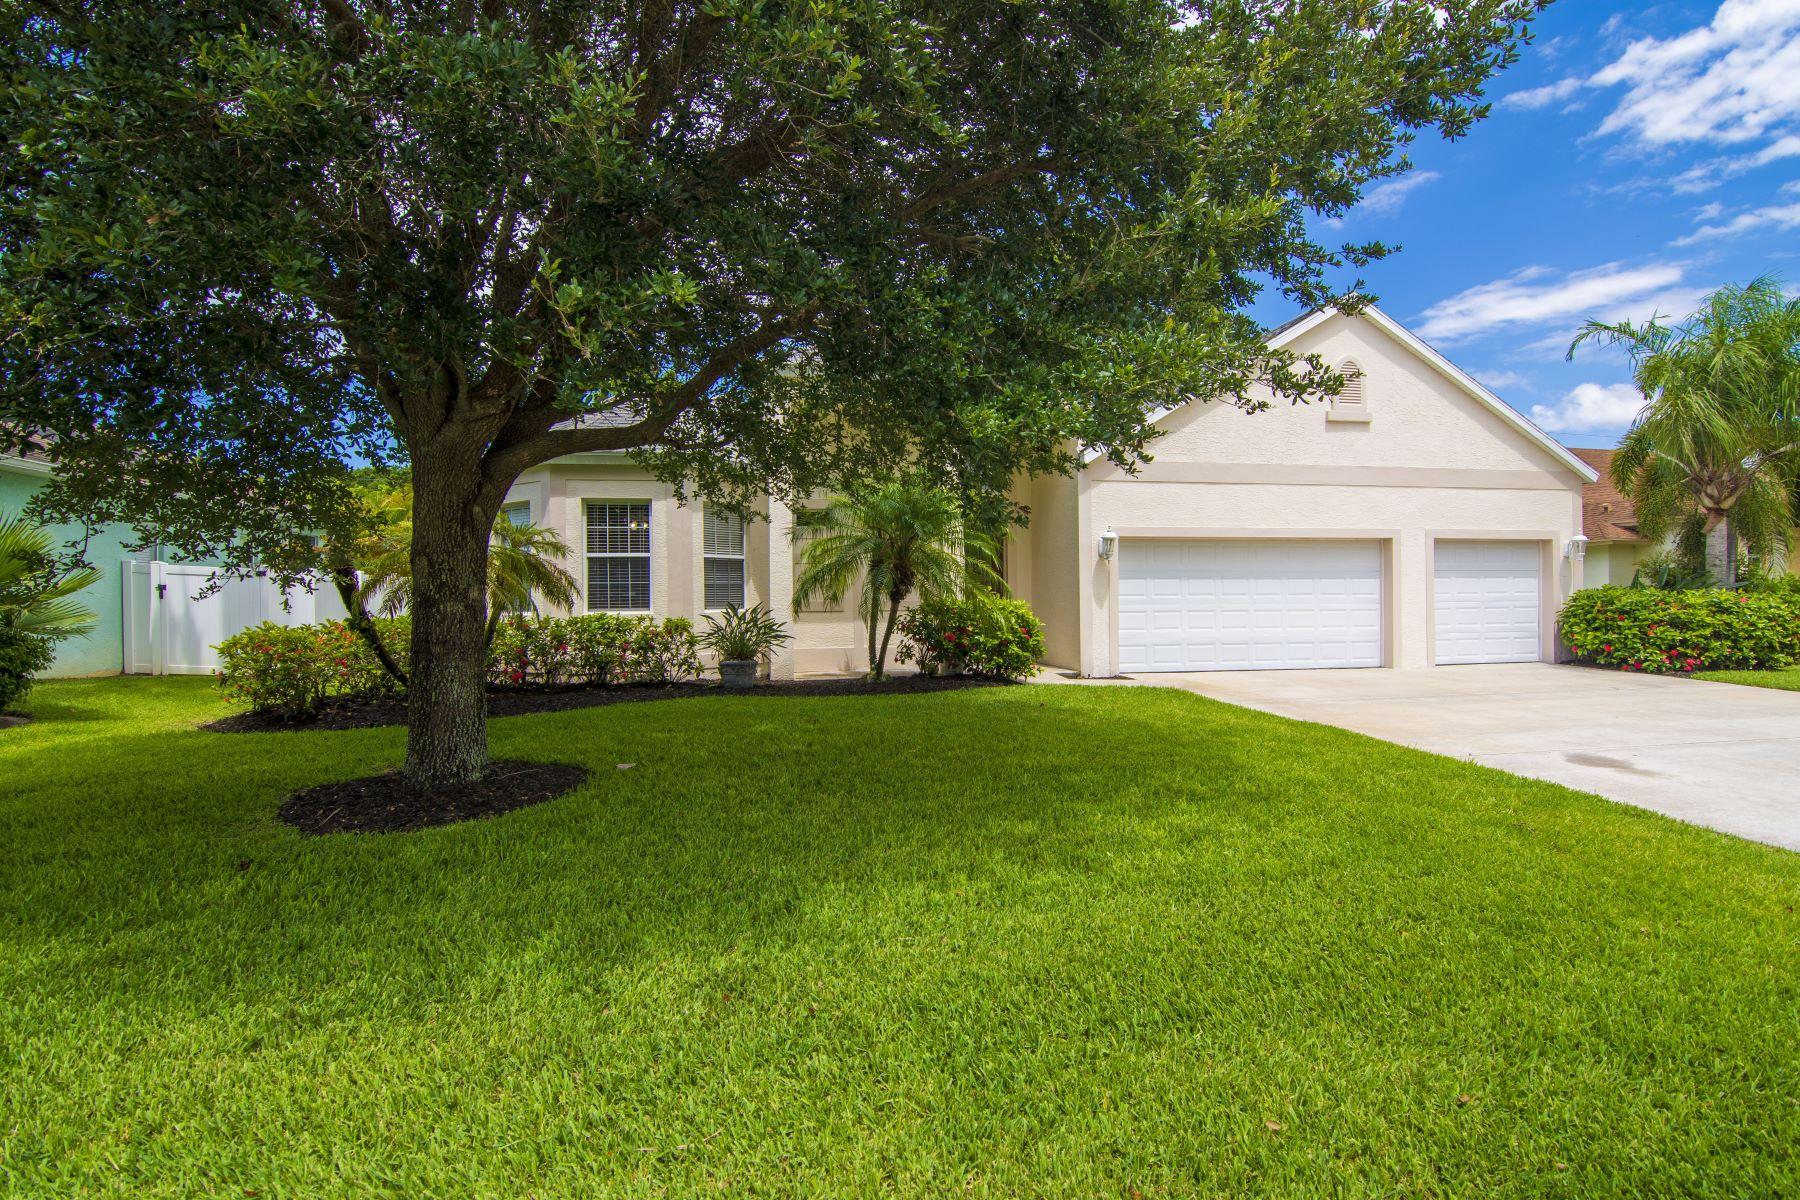 Single Family Homes 为 销售 在 390 21st Court Sw, Vero Beach, FL 390 21st Court Sw 维罗海滩, 佛罗里达州 32962 美国